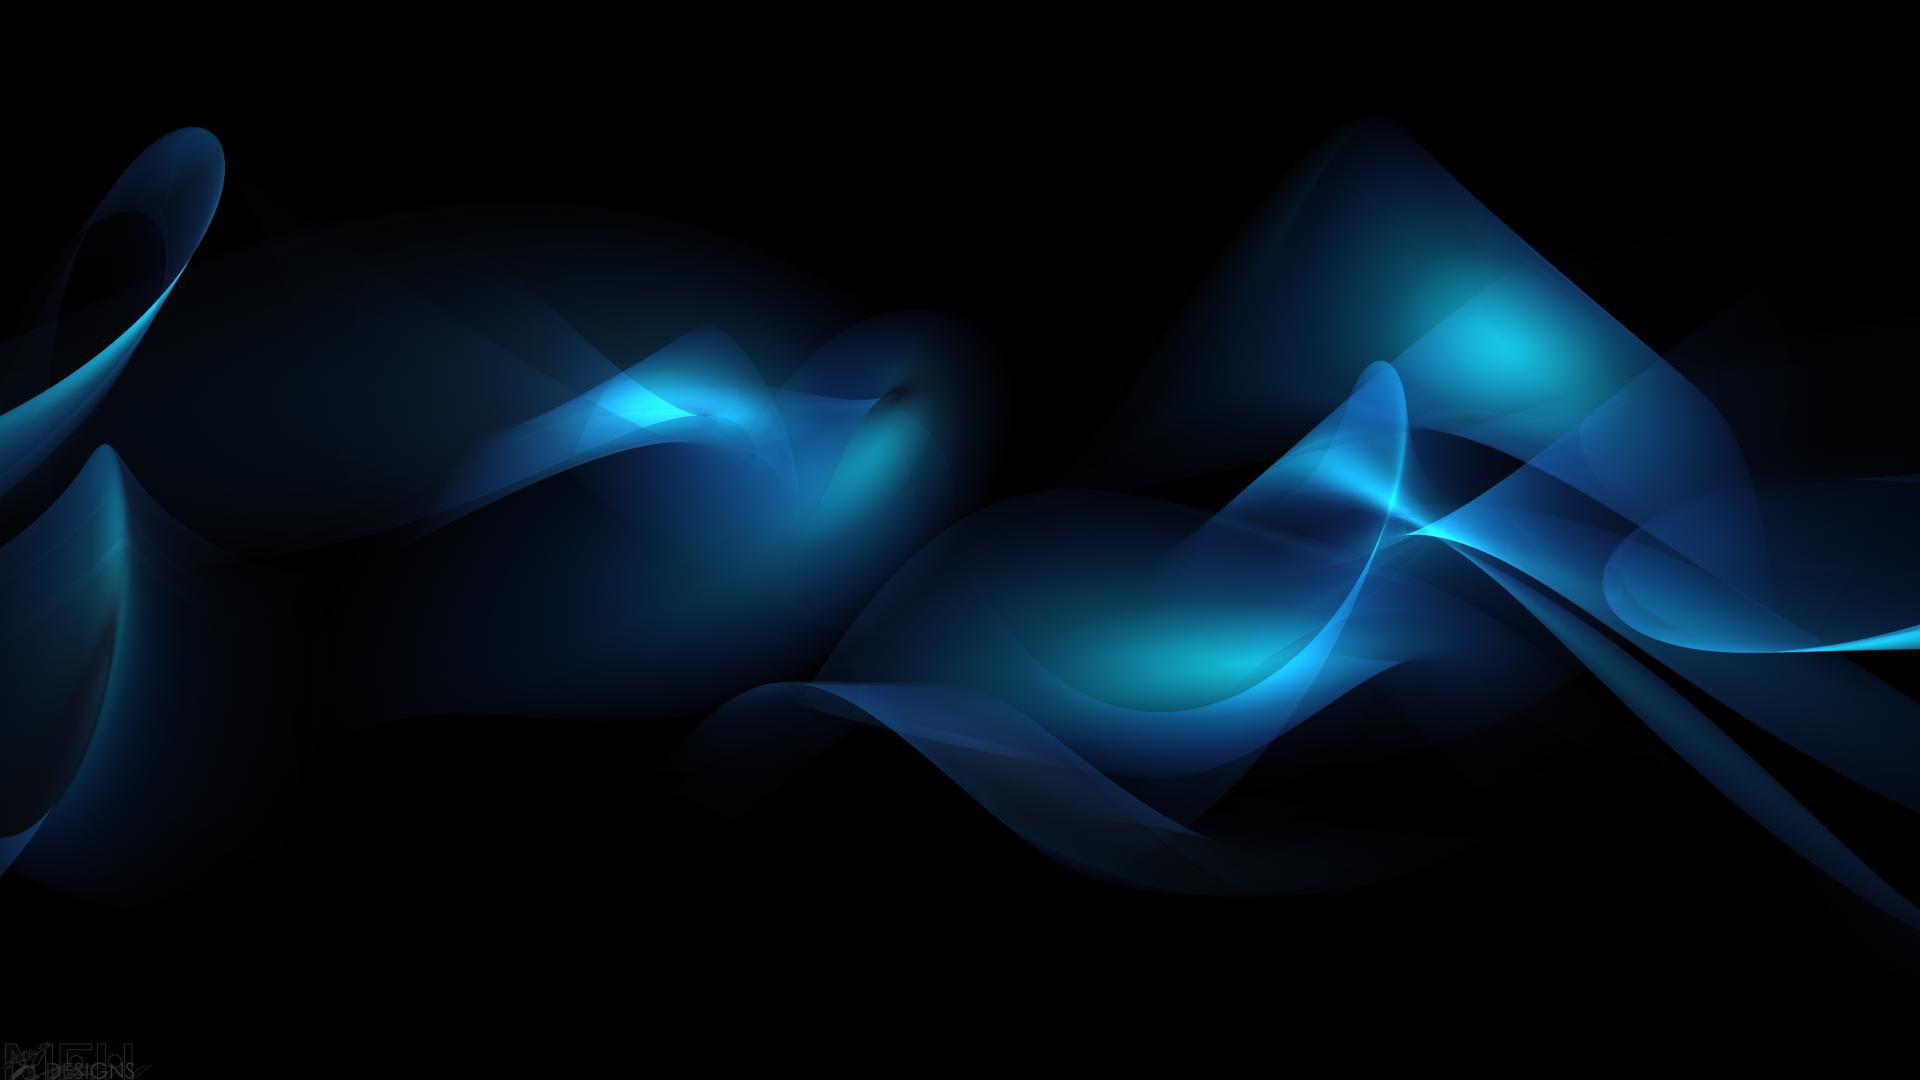 1920x1080px 1080P Blue Wallpaper 1920x1080